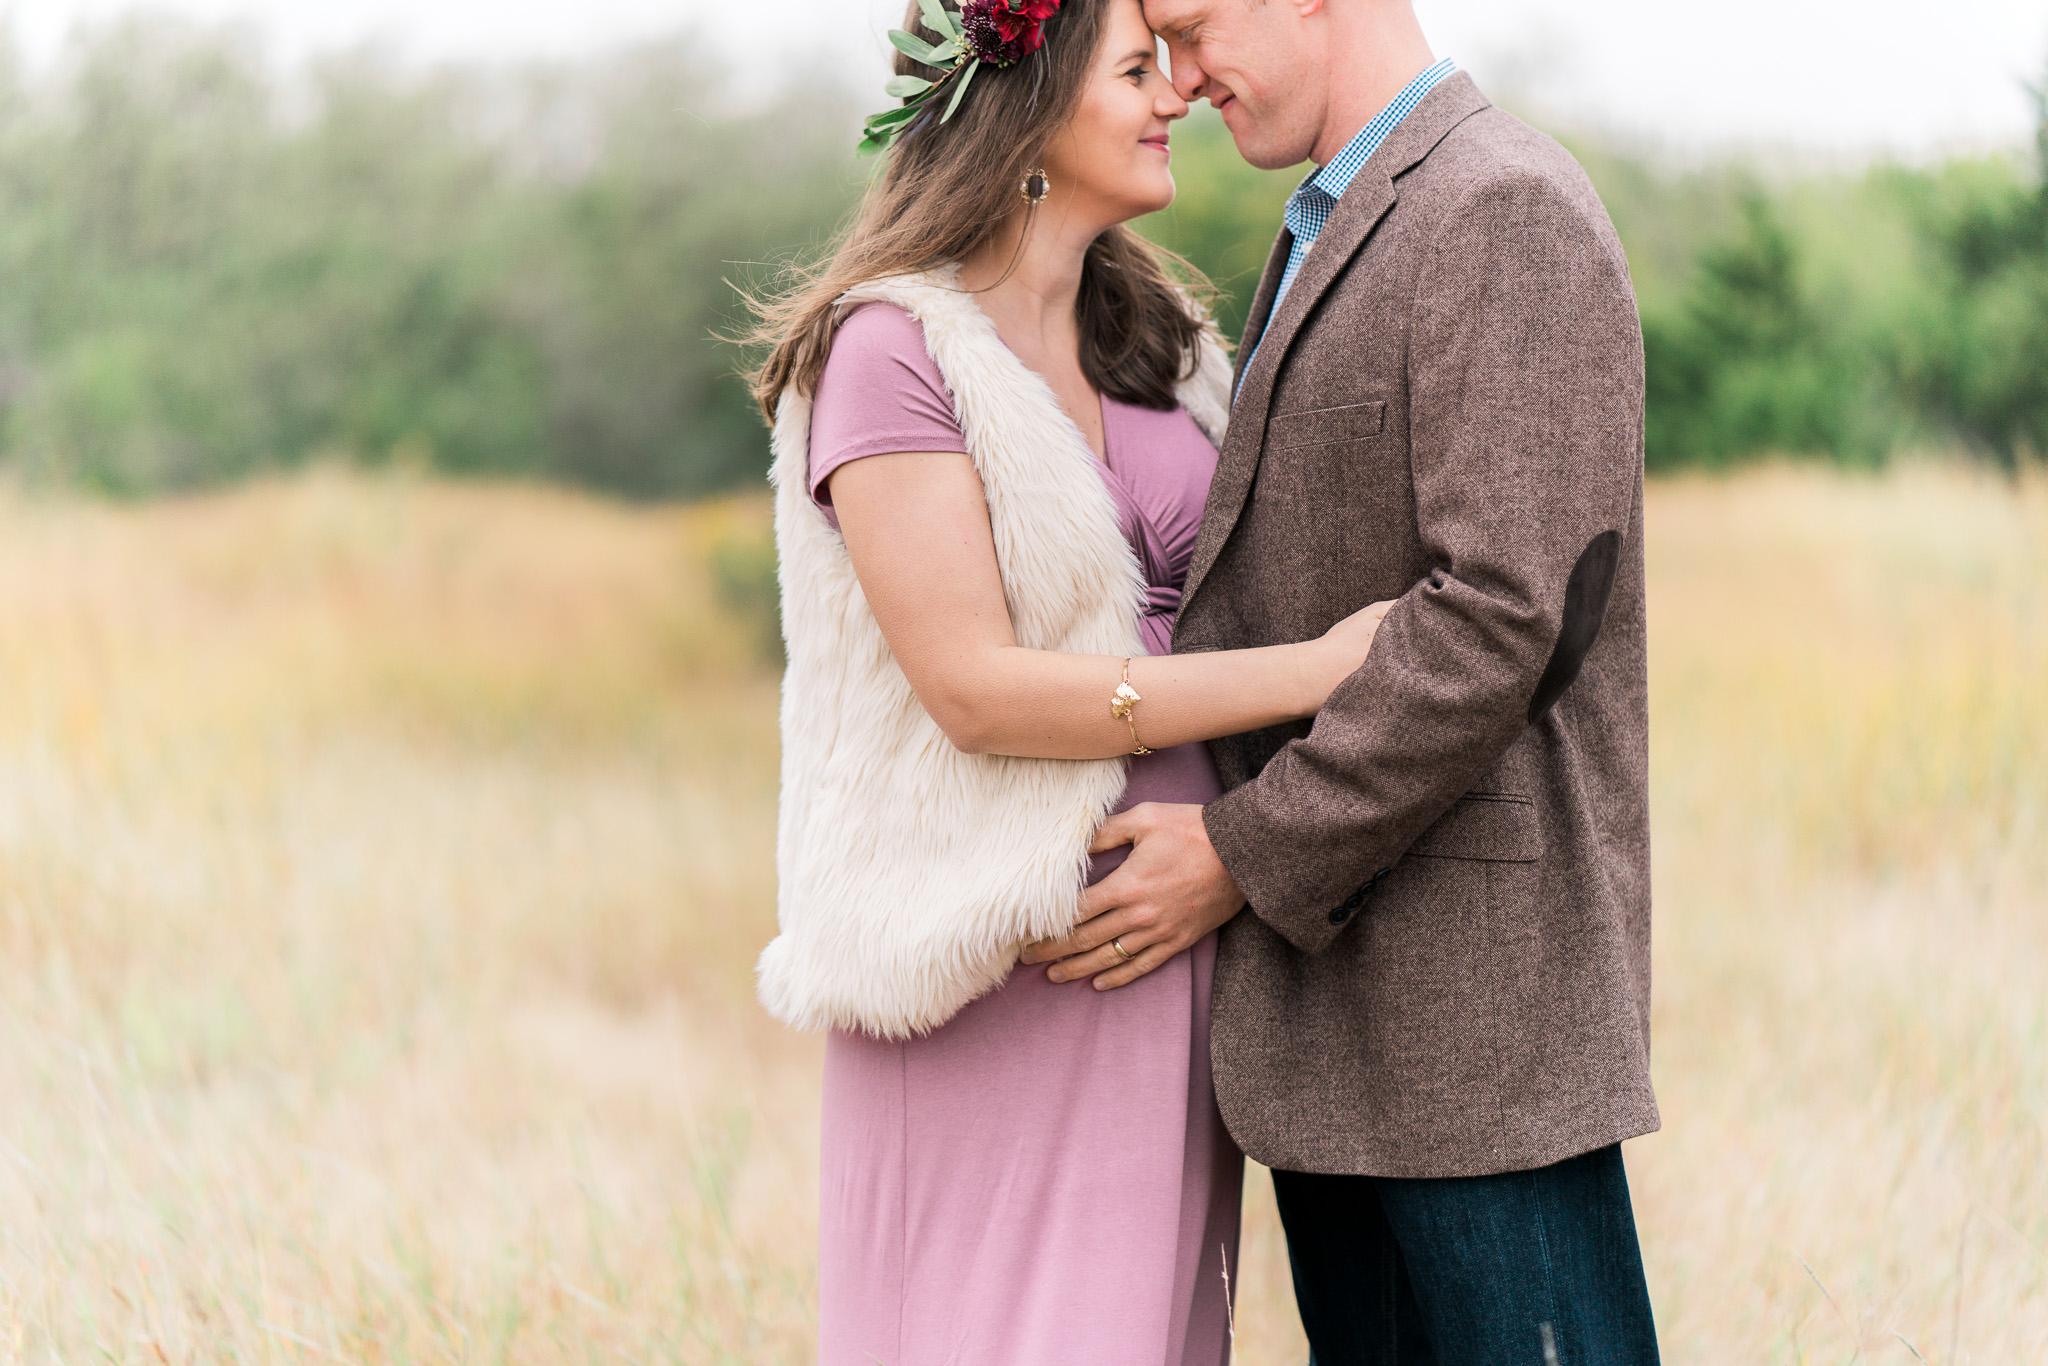 Lizanne-Andrew-Maternity-Kate-Bernard-Photography-Web-27.jpg